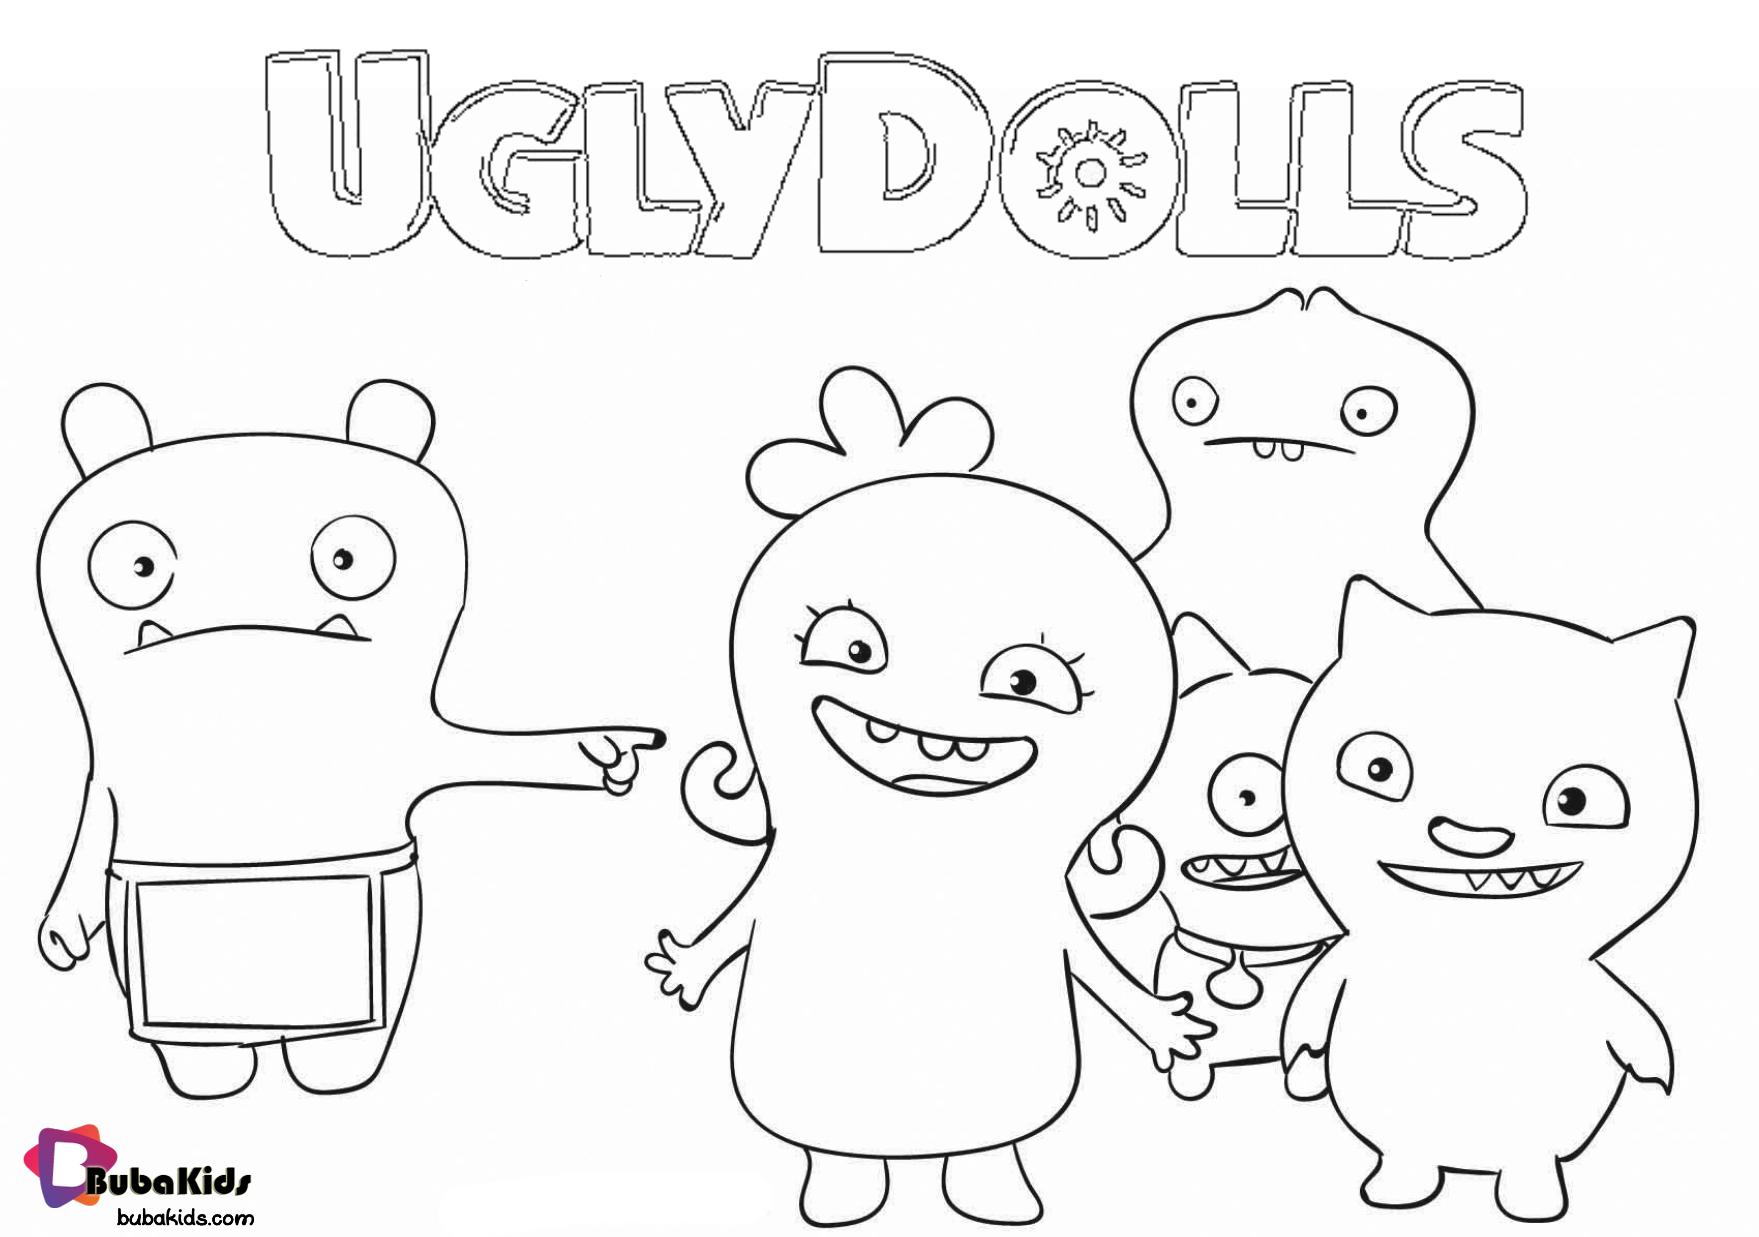 Free Printable Uglydolls Coloring Page Coloring Sheet Uglydolls Coloringsheet Uglydoll Cartoon Coloring Pages Coloring Pages Coloring Pages Inspirational